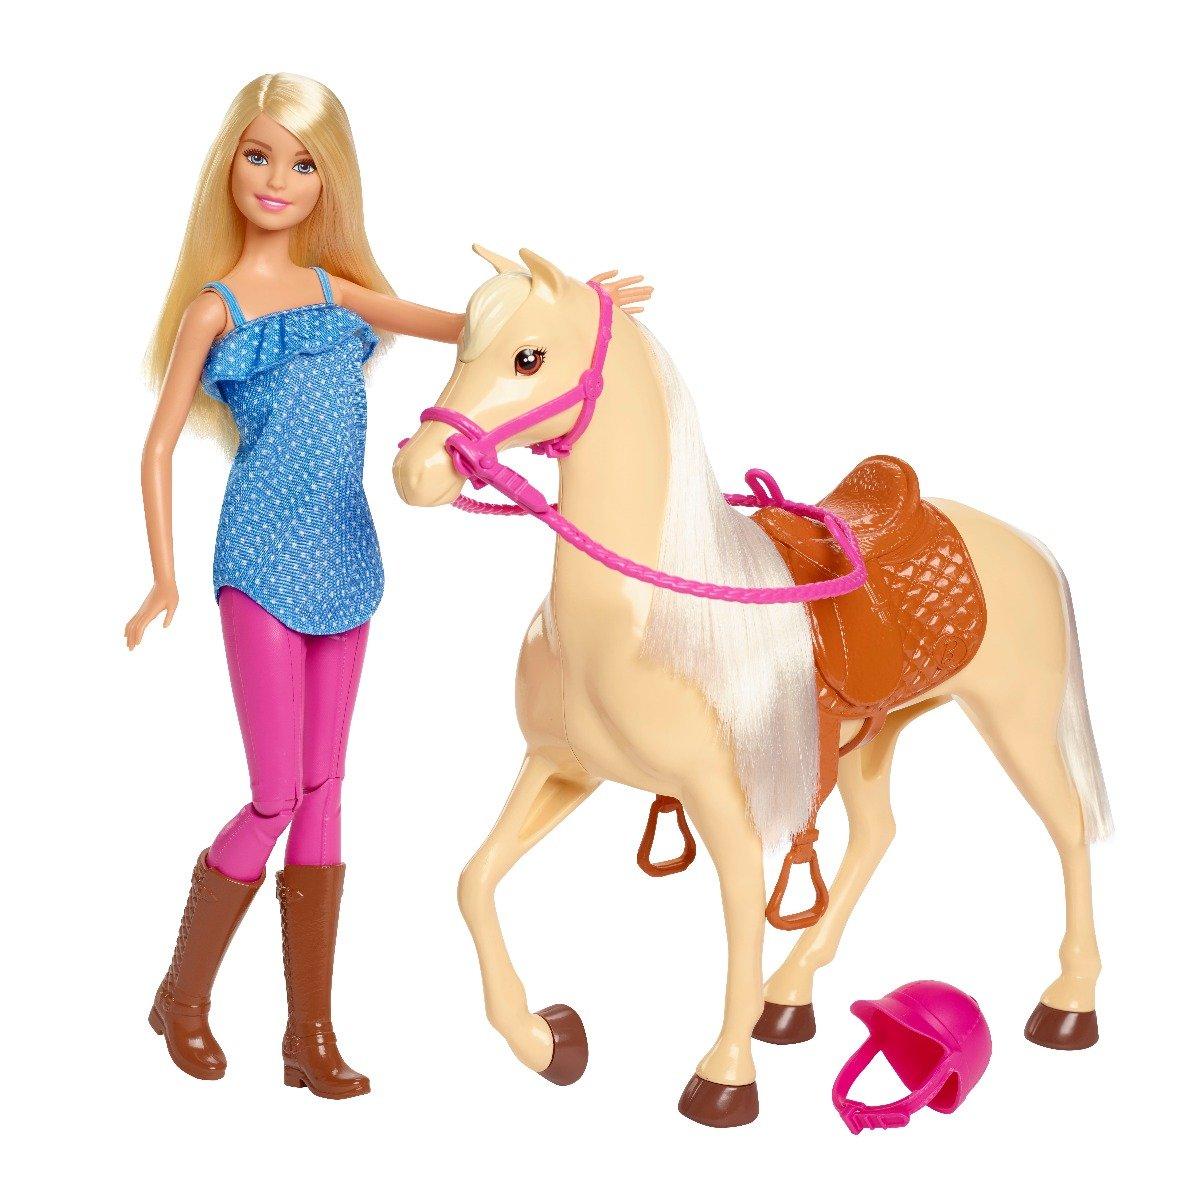 Set de joaca Barbie, Papusa si calut